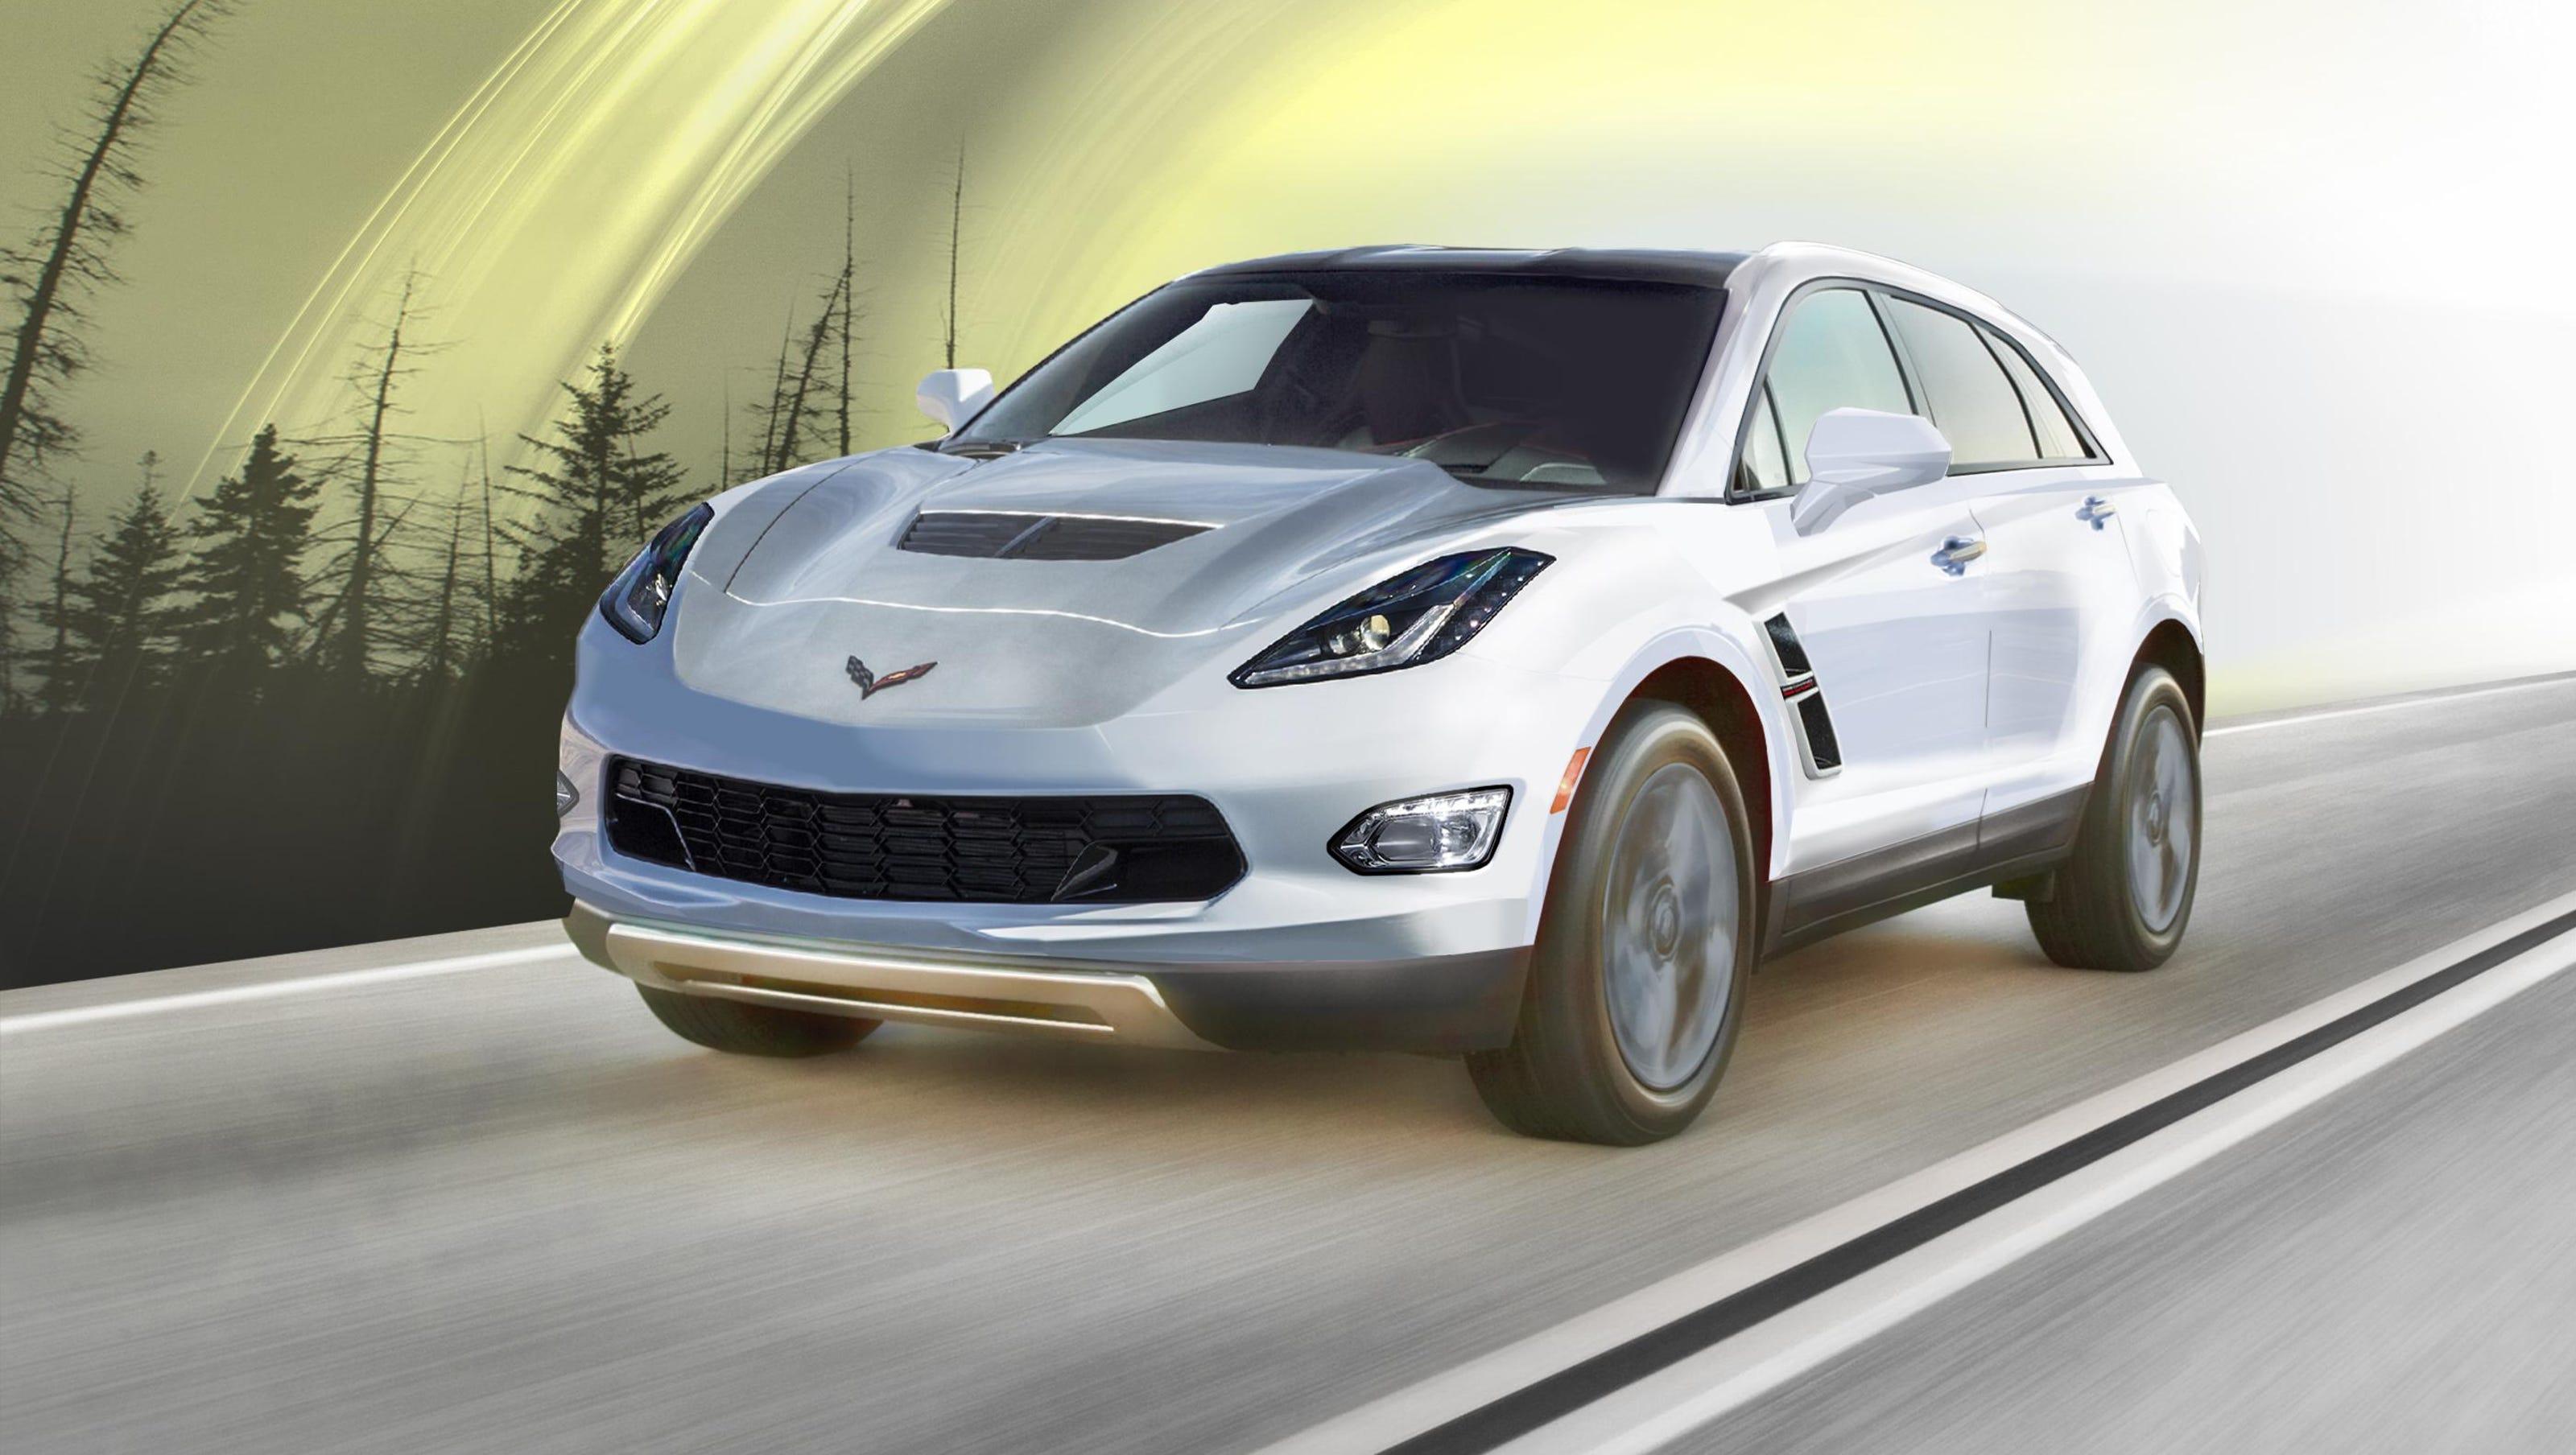 What if GM built a Corvette SUV?